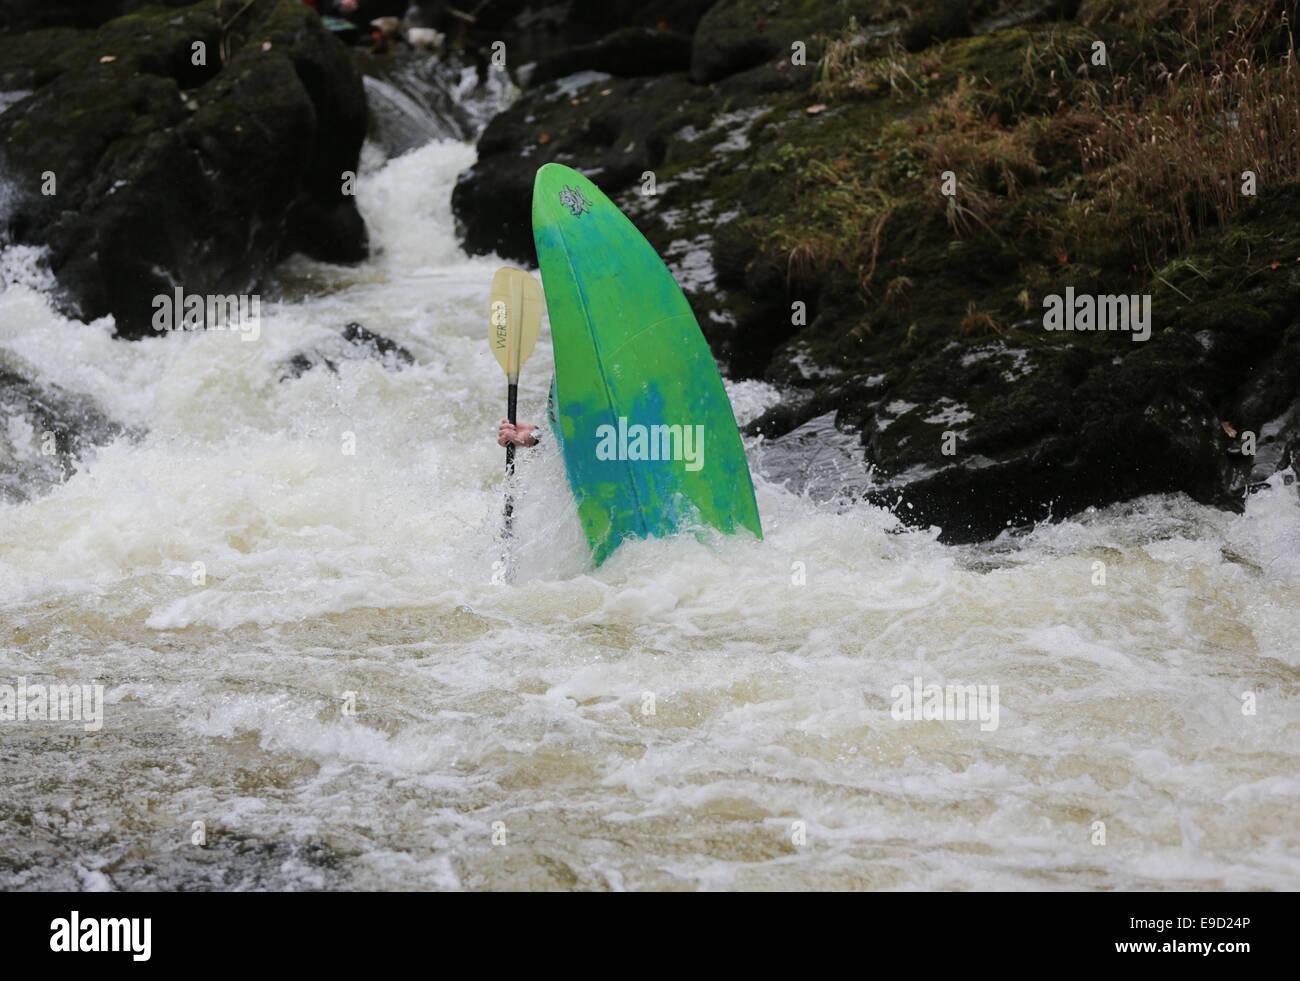 Llandysul, Wales, UK. 25th Oct, 2014. Hundreds of paddlers gather at Llandysul to enjoy the annual two day Teifi Stock Photo